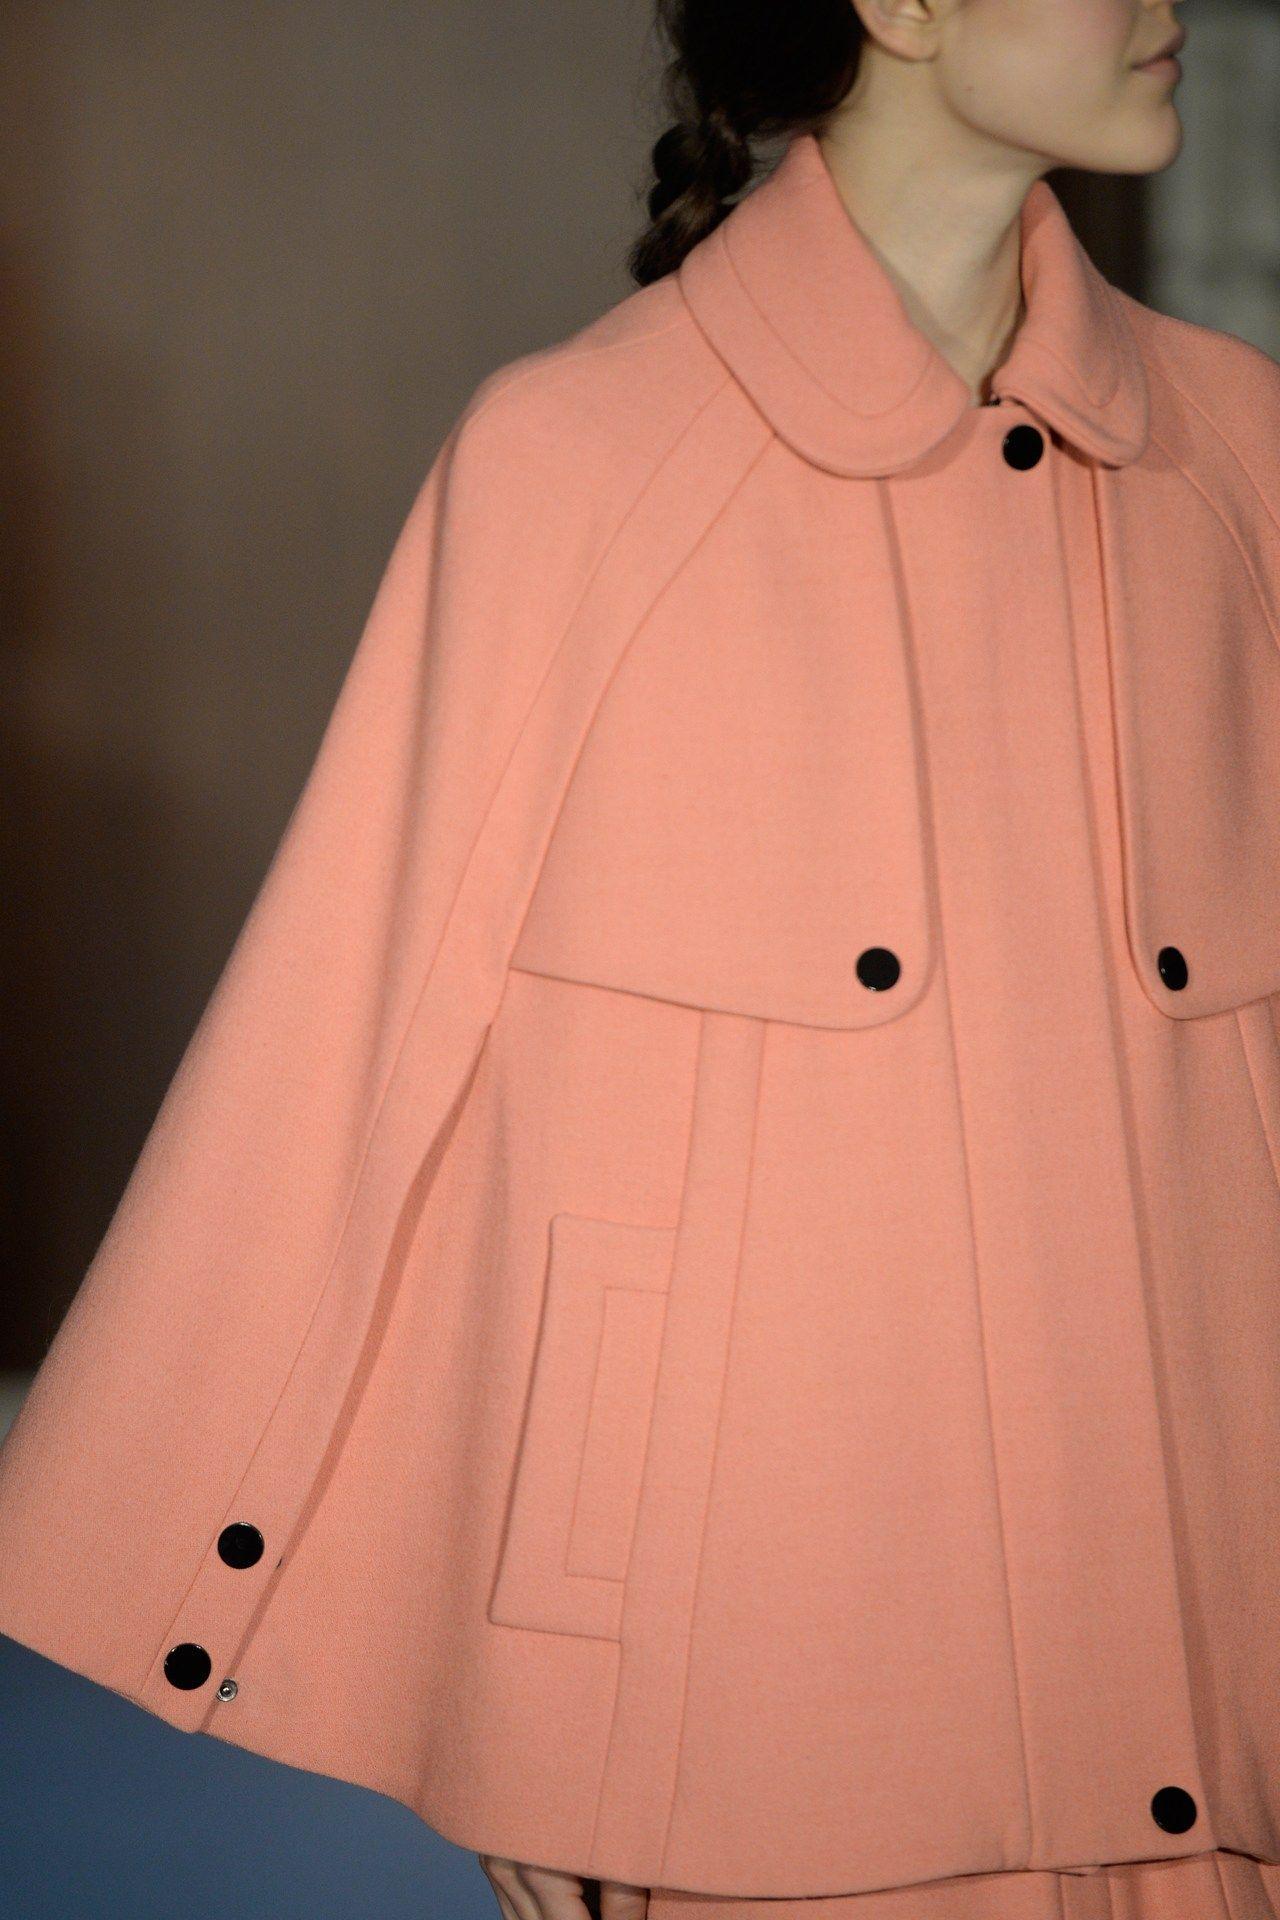 32db003d8c Orla Kiely Autumn/Winter 2015 Ready-To-Wear   MILAN, LONDON, PARIS ...